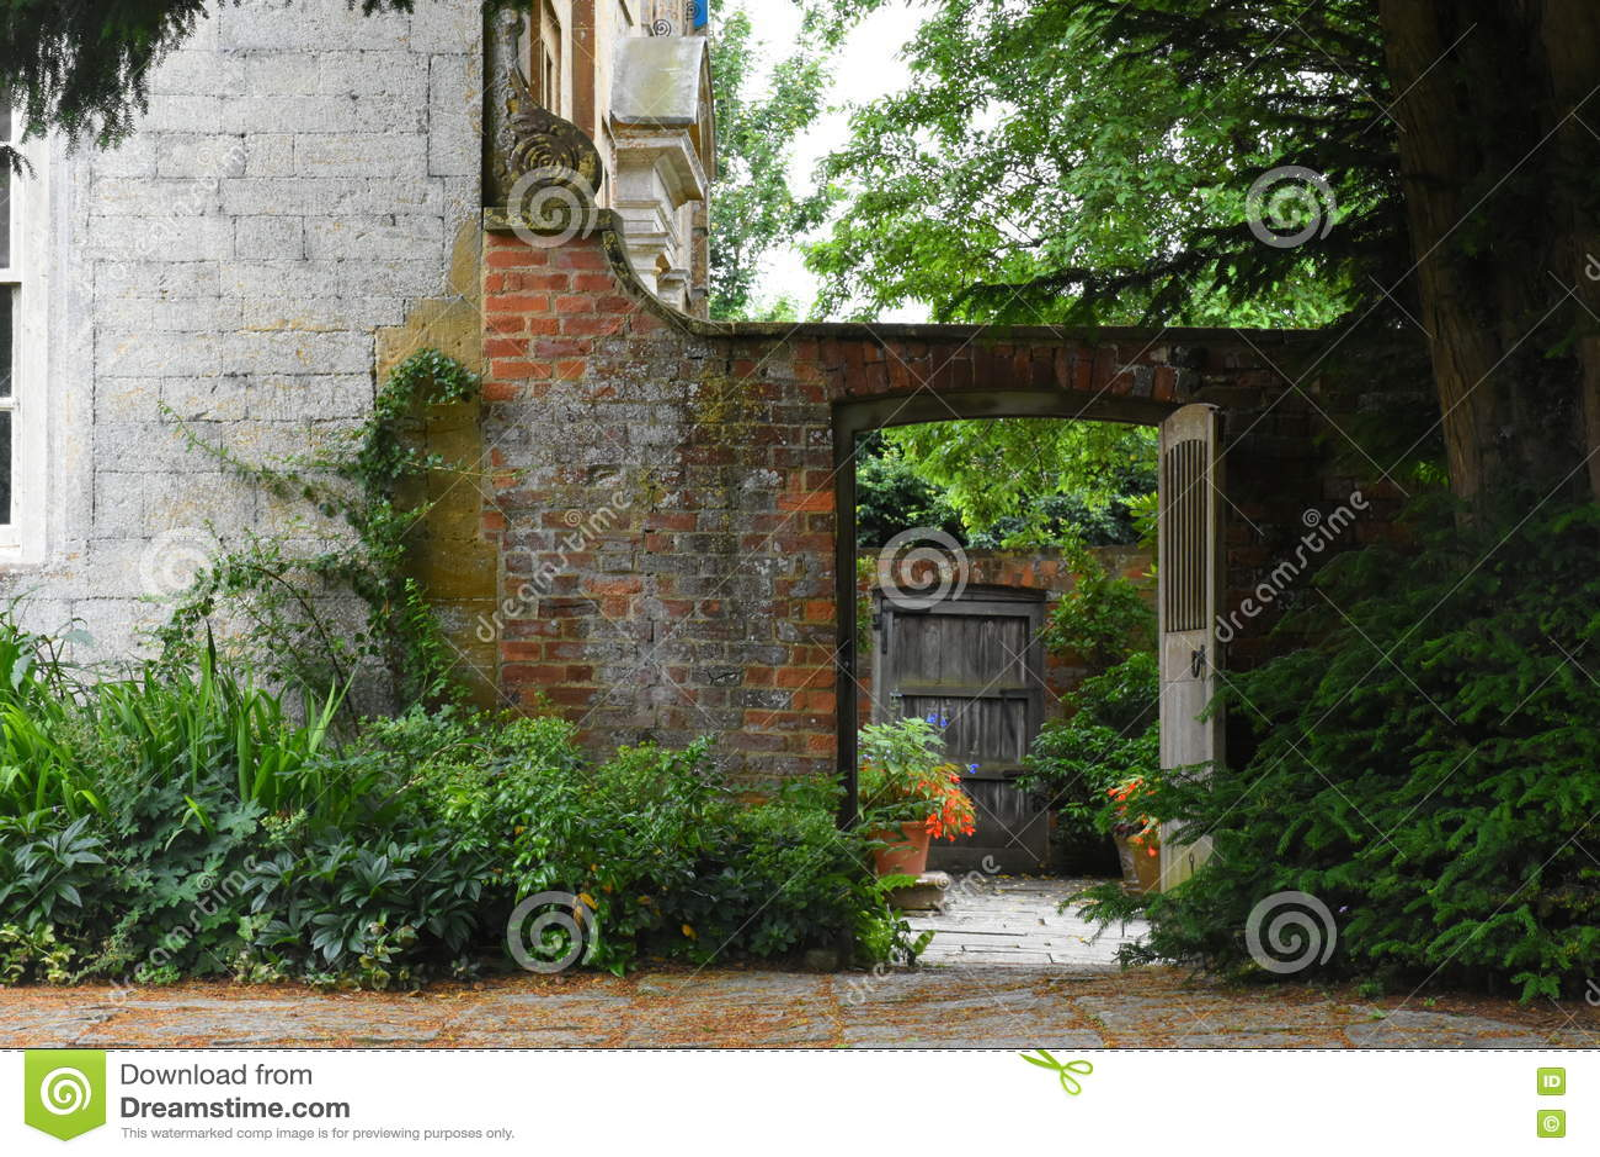 Ingresso camera di tintinhull e giardino somerset - Ingresso giardino ...